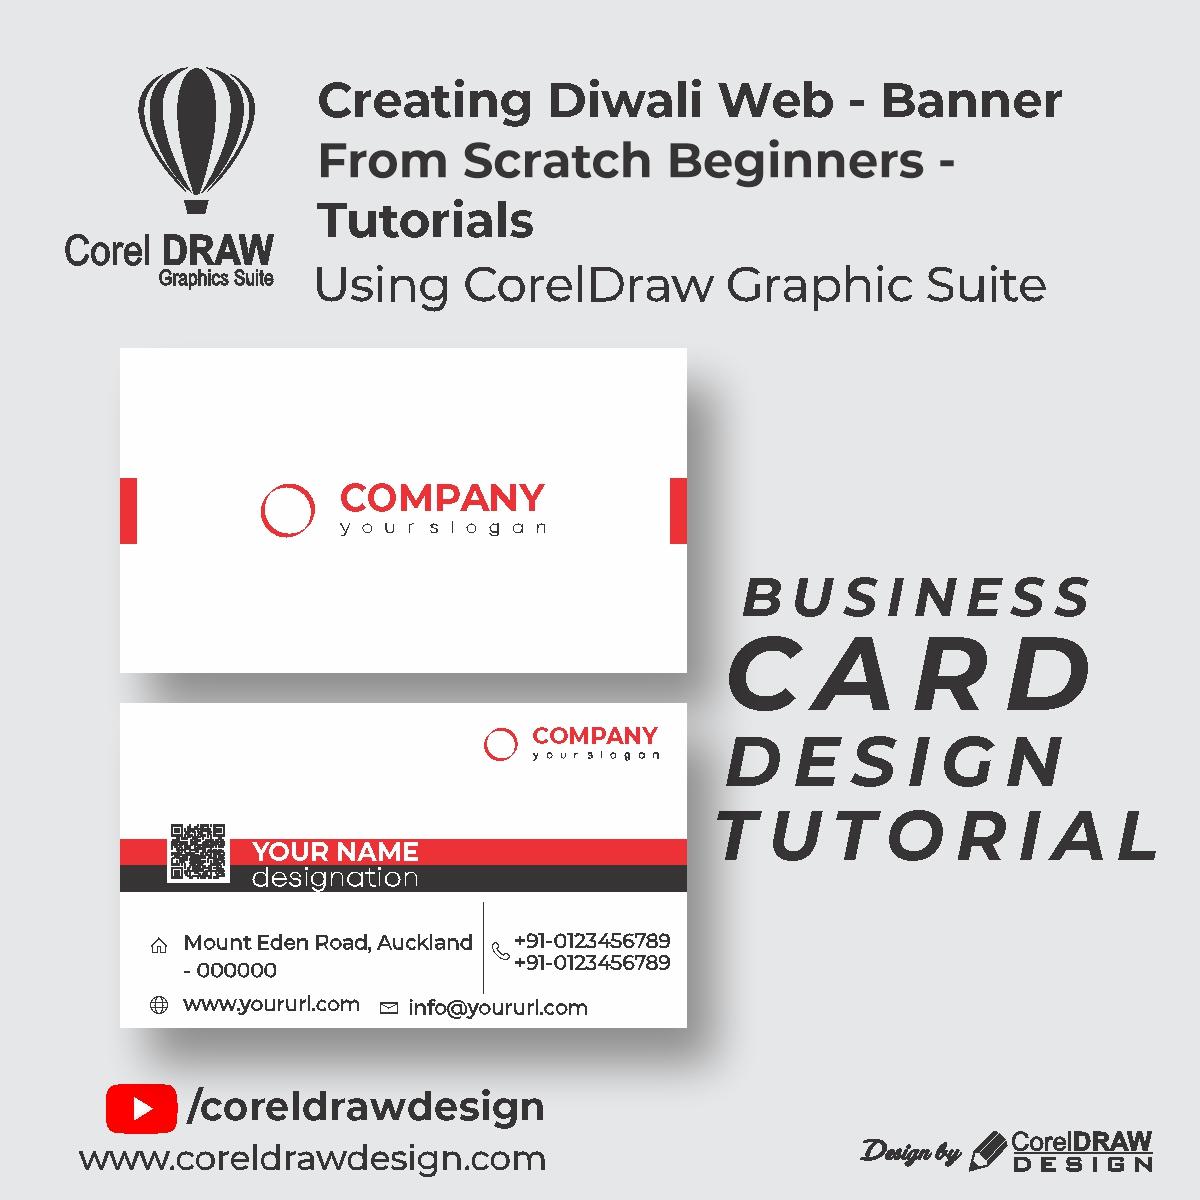 Coreldraw Flat Business Card - Basic Tutorials - Digital Graphics - Beginners Class - Tutorial